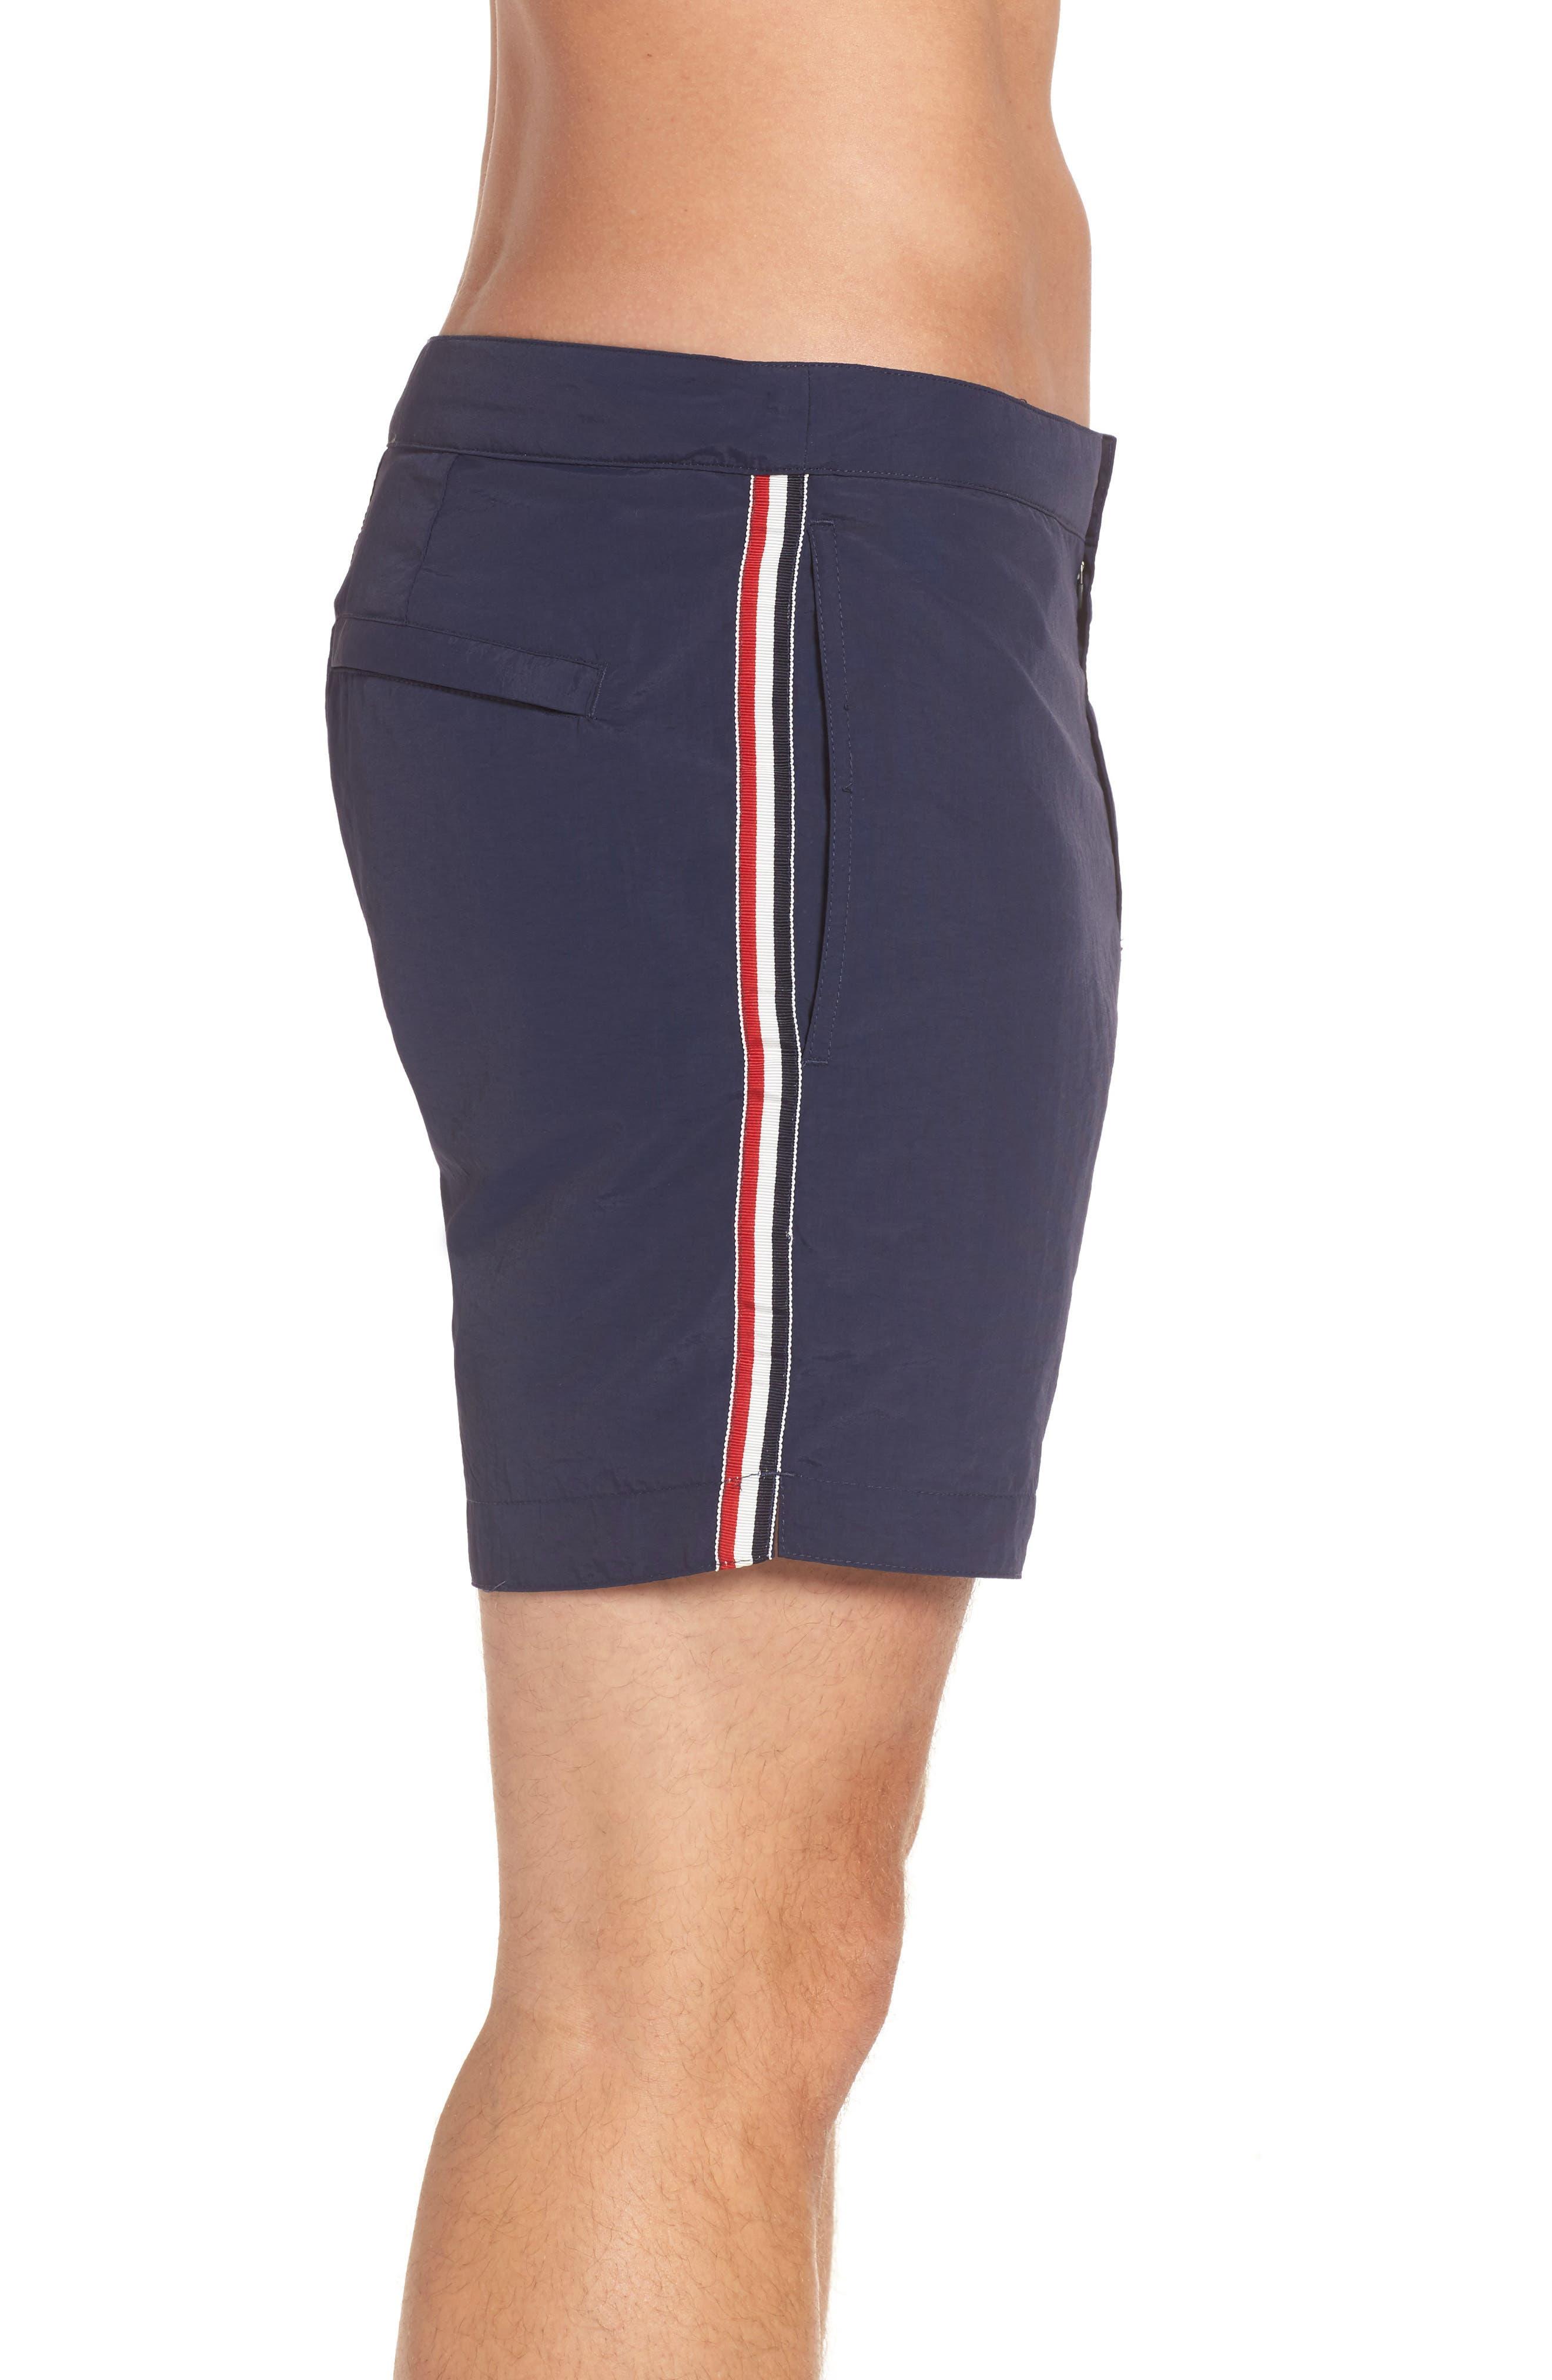 Aruba Tailored Fit French Stripe Swim Trunks,                             Alternate thumbnail 3, color,                             Navy French Stripes